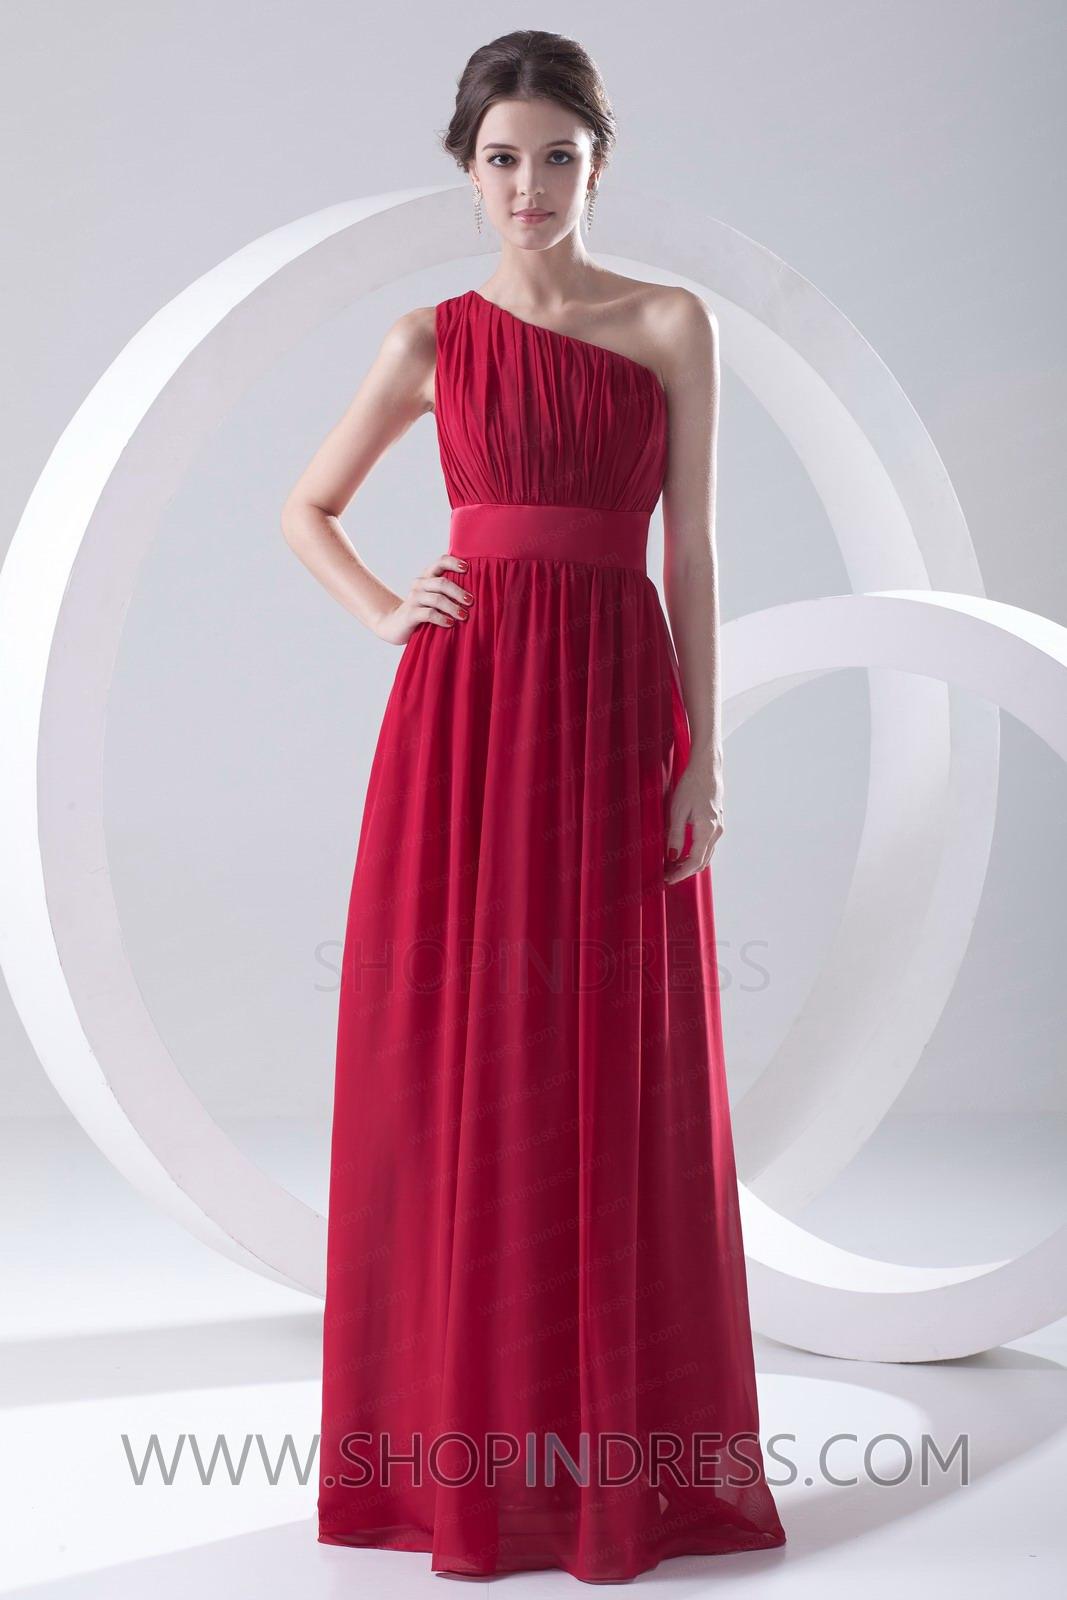 found my prom dress d beauty insider community